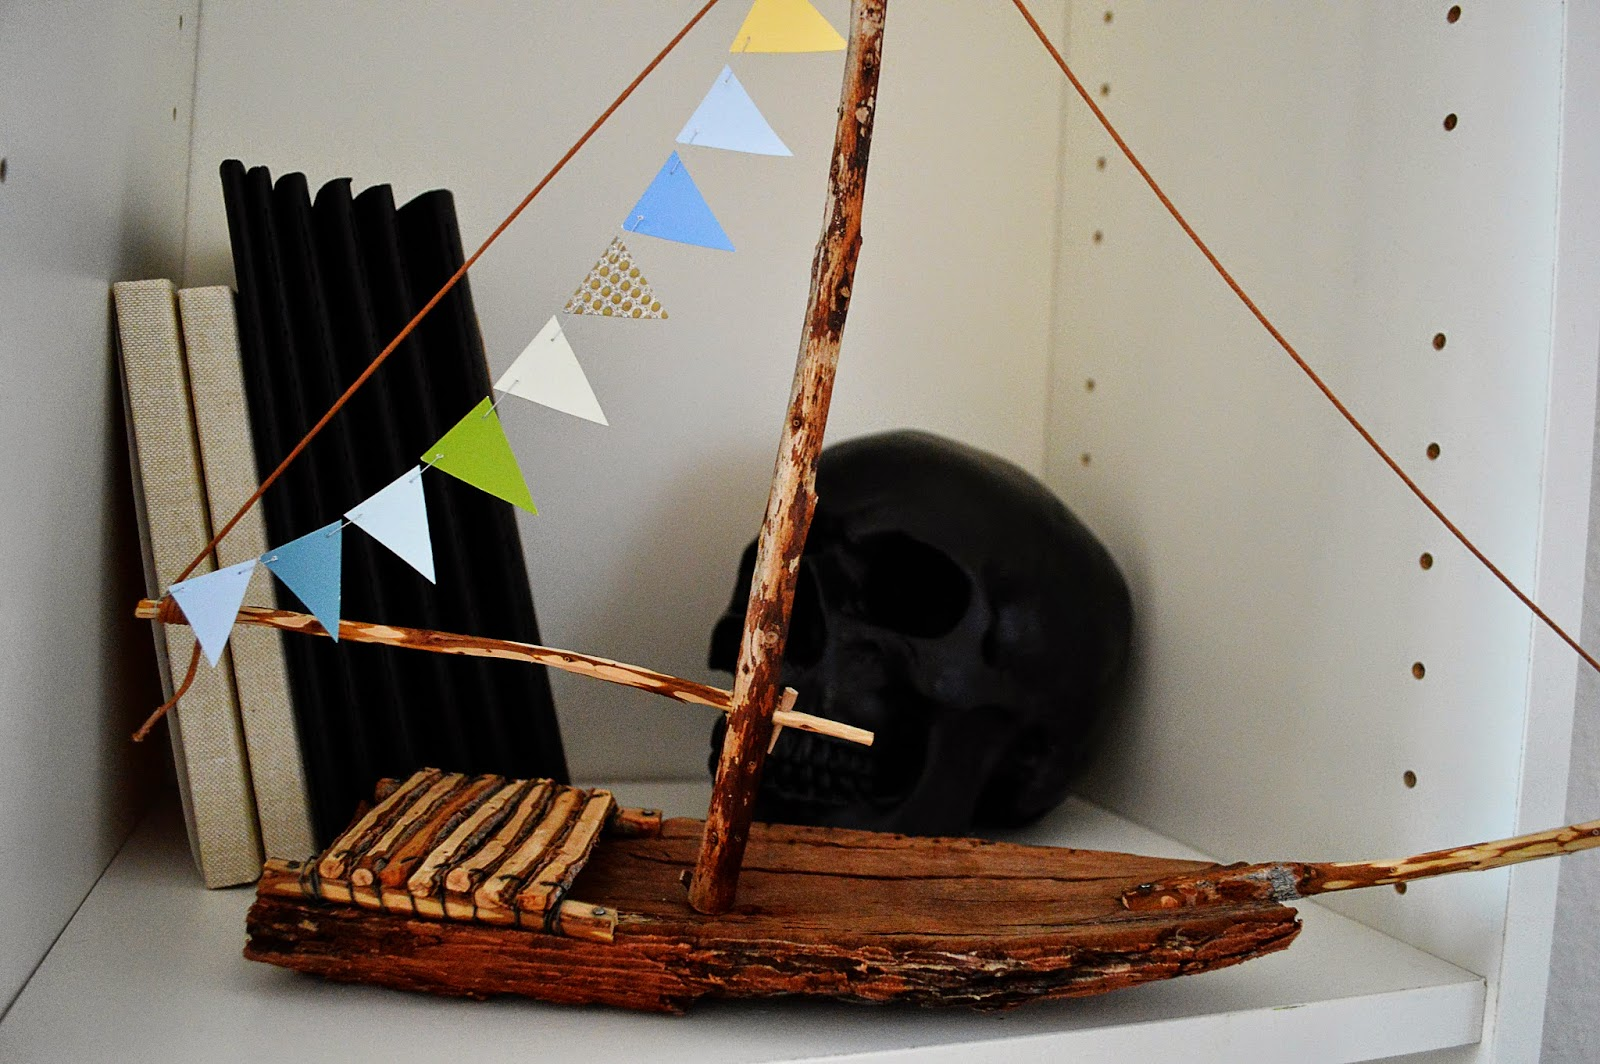 DIY Wooden Boat DIY Paper Bunting | Motte's Blog